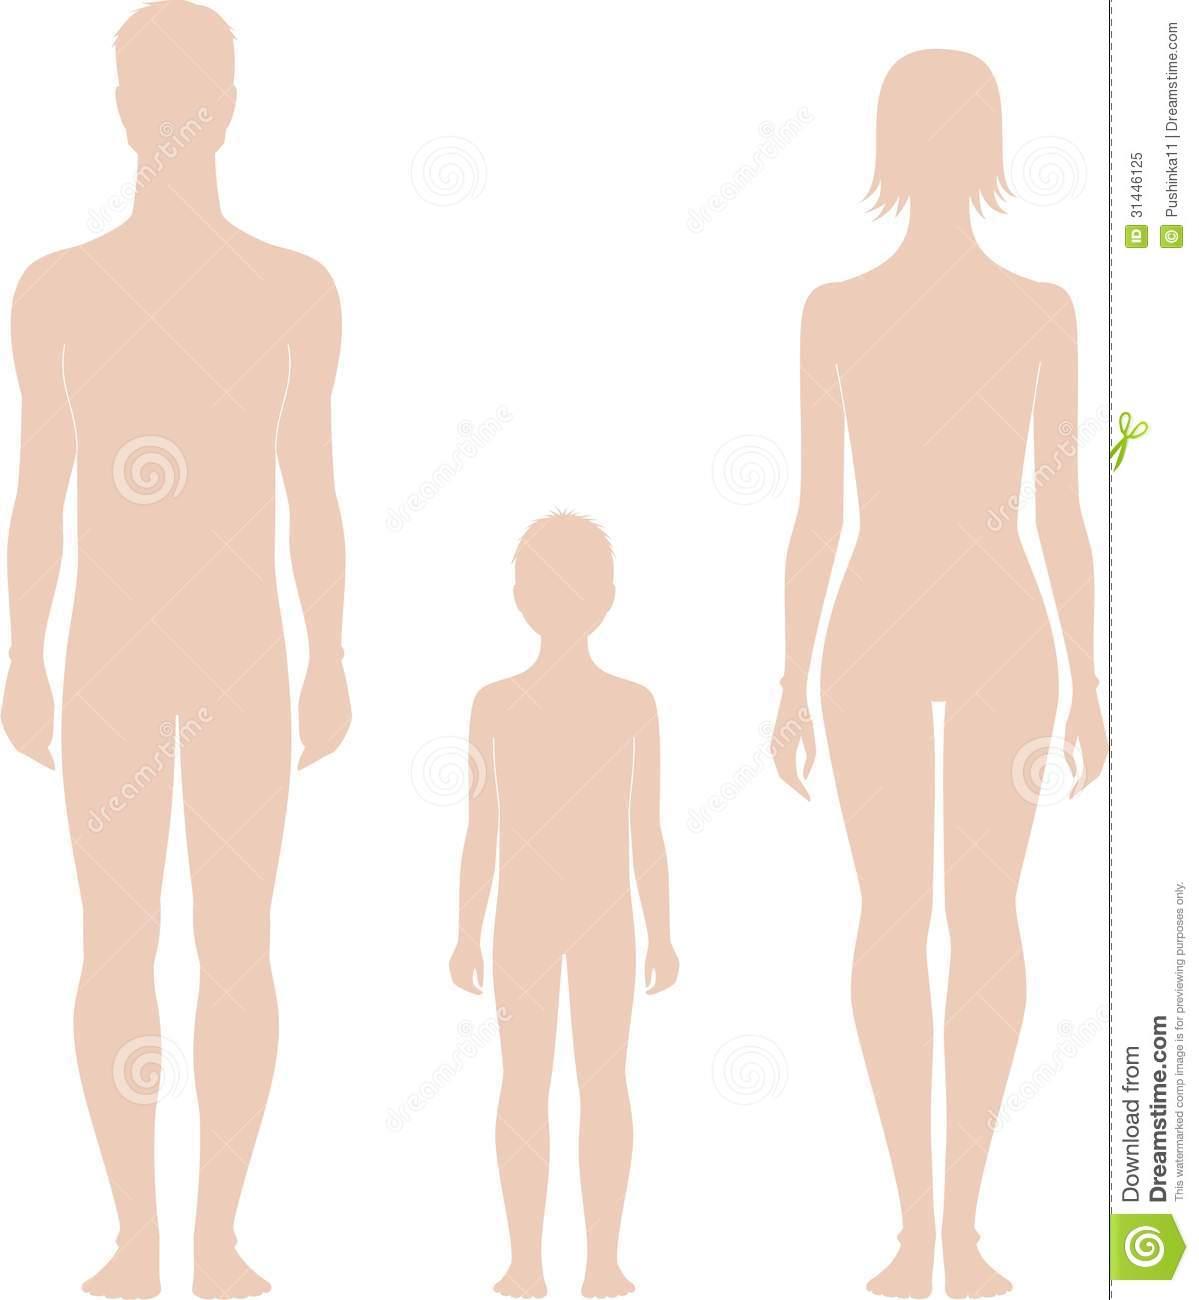 1199x1300 Human Figures Vector Illustration Man Woman Child Silhouettes